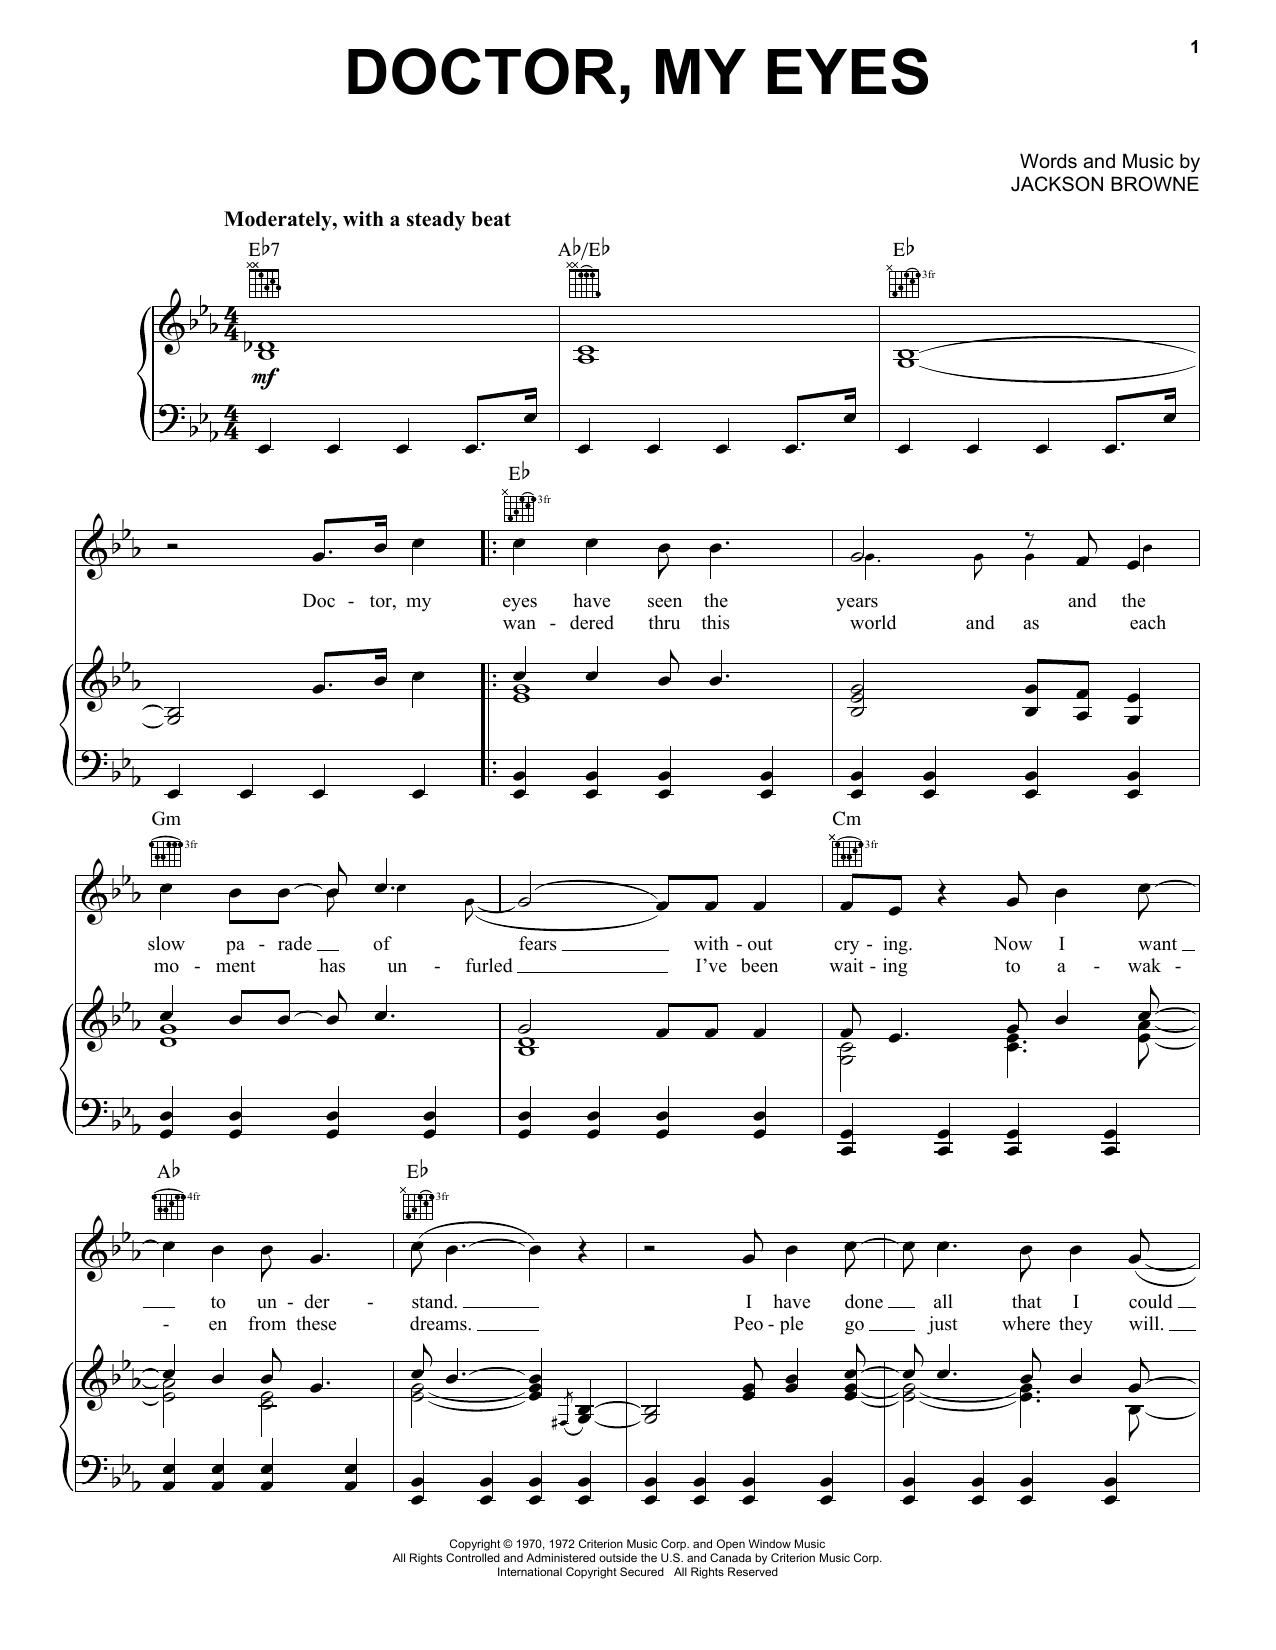 Jackson Browne Doctor, My Eyes sheet music notes and chords. Download Printable PDF.